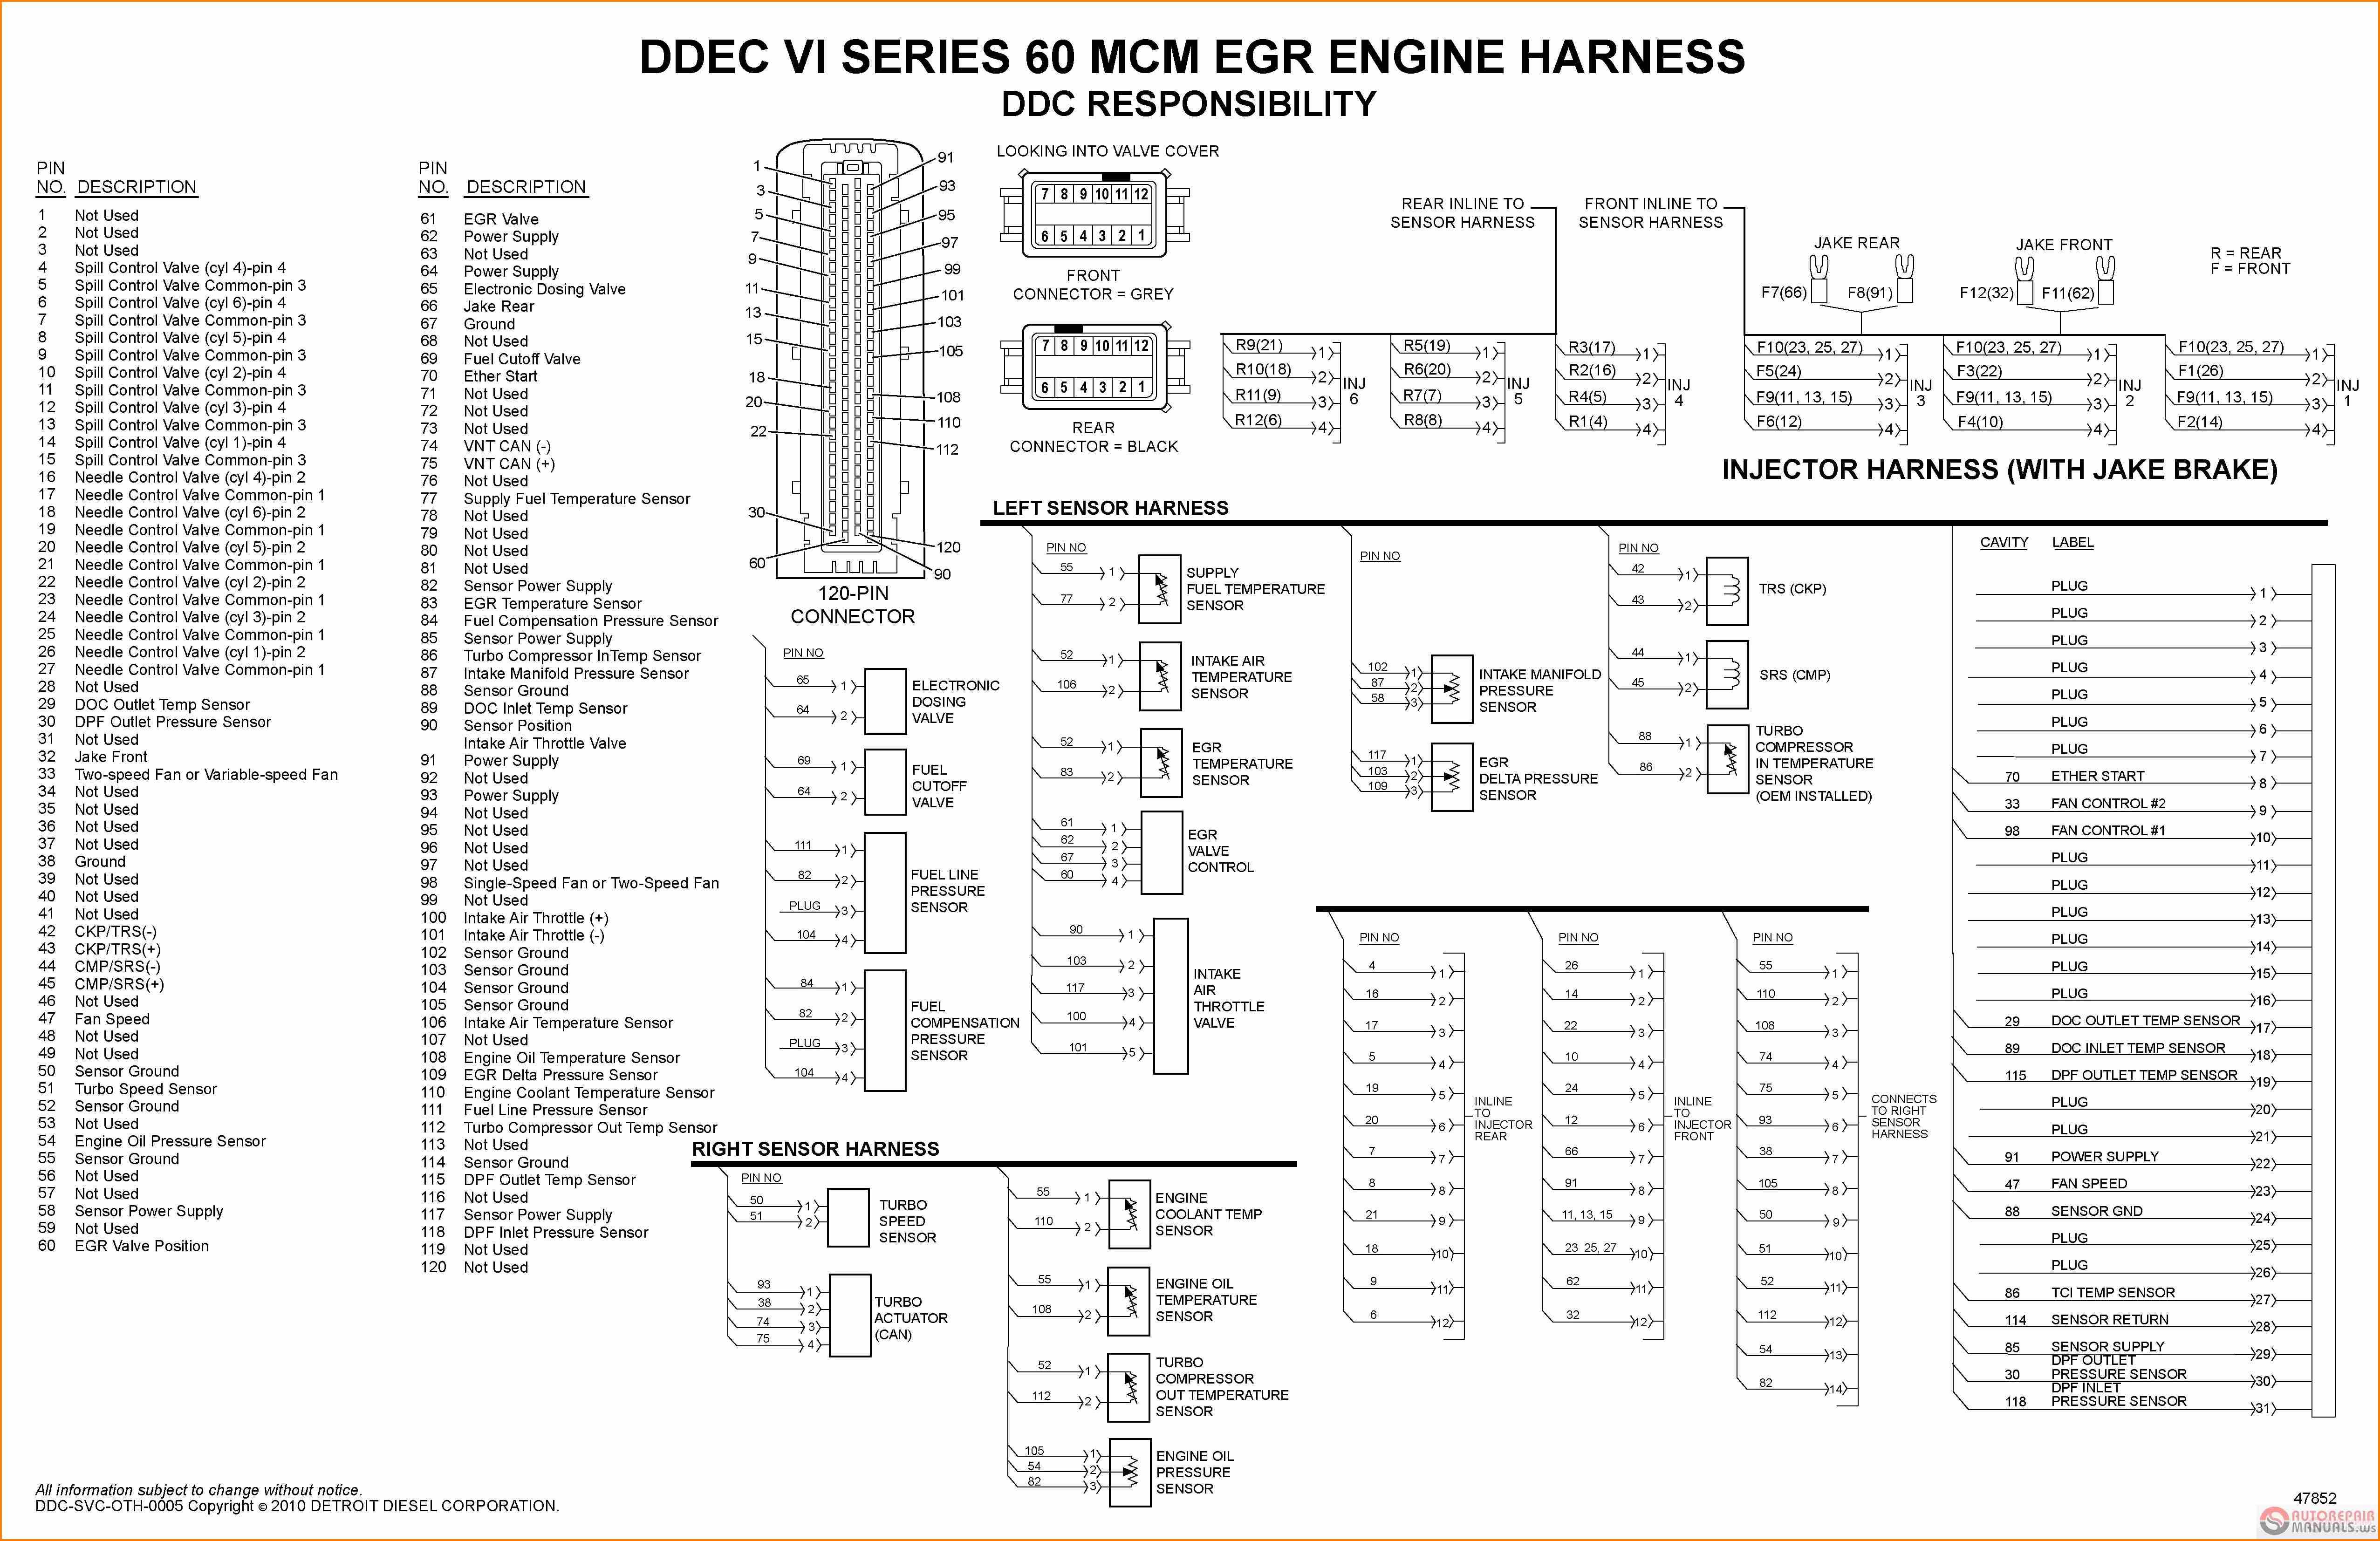 Ecm Detroit Ddec 5 Wiring Diagram | Wiring Diagram - Detroit Series 60 Ecm Wiring Diagram